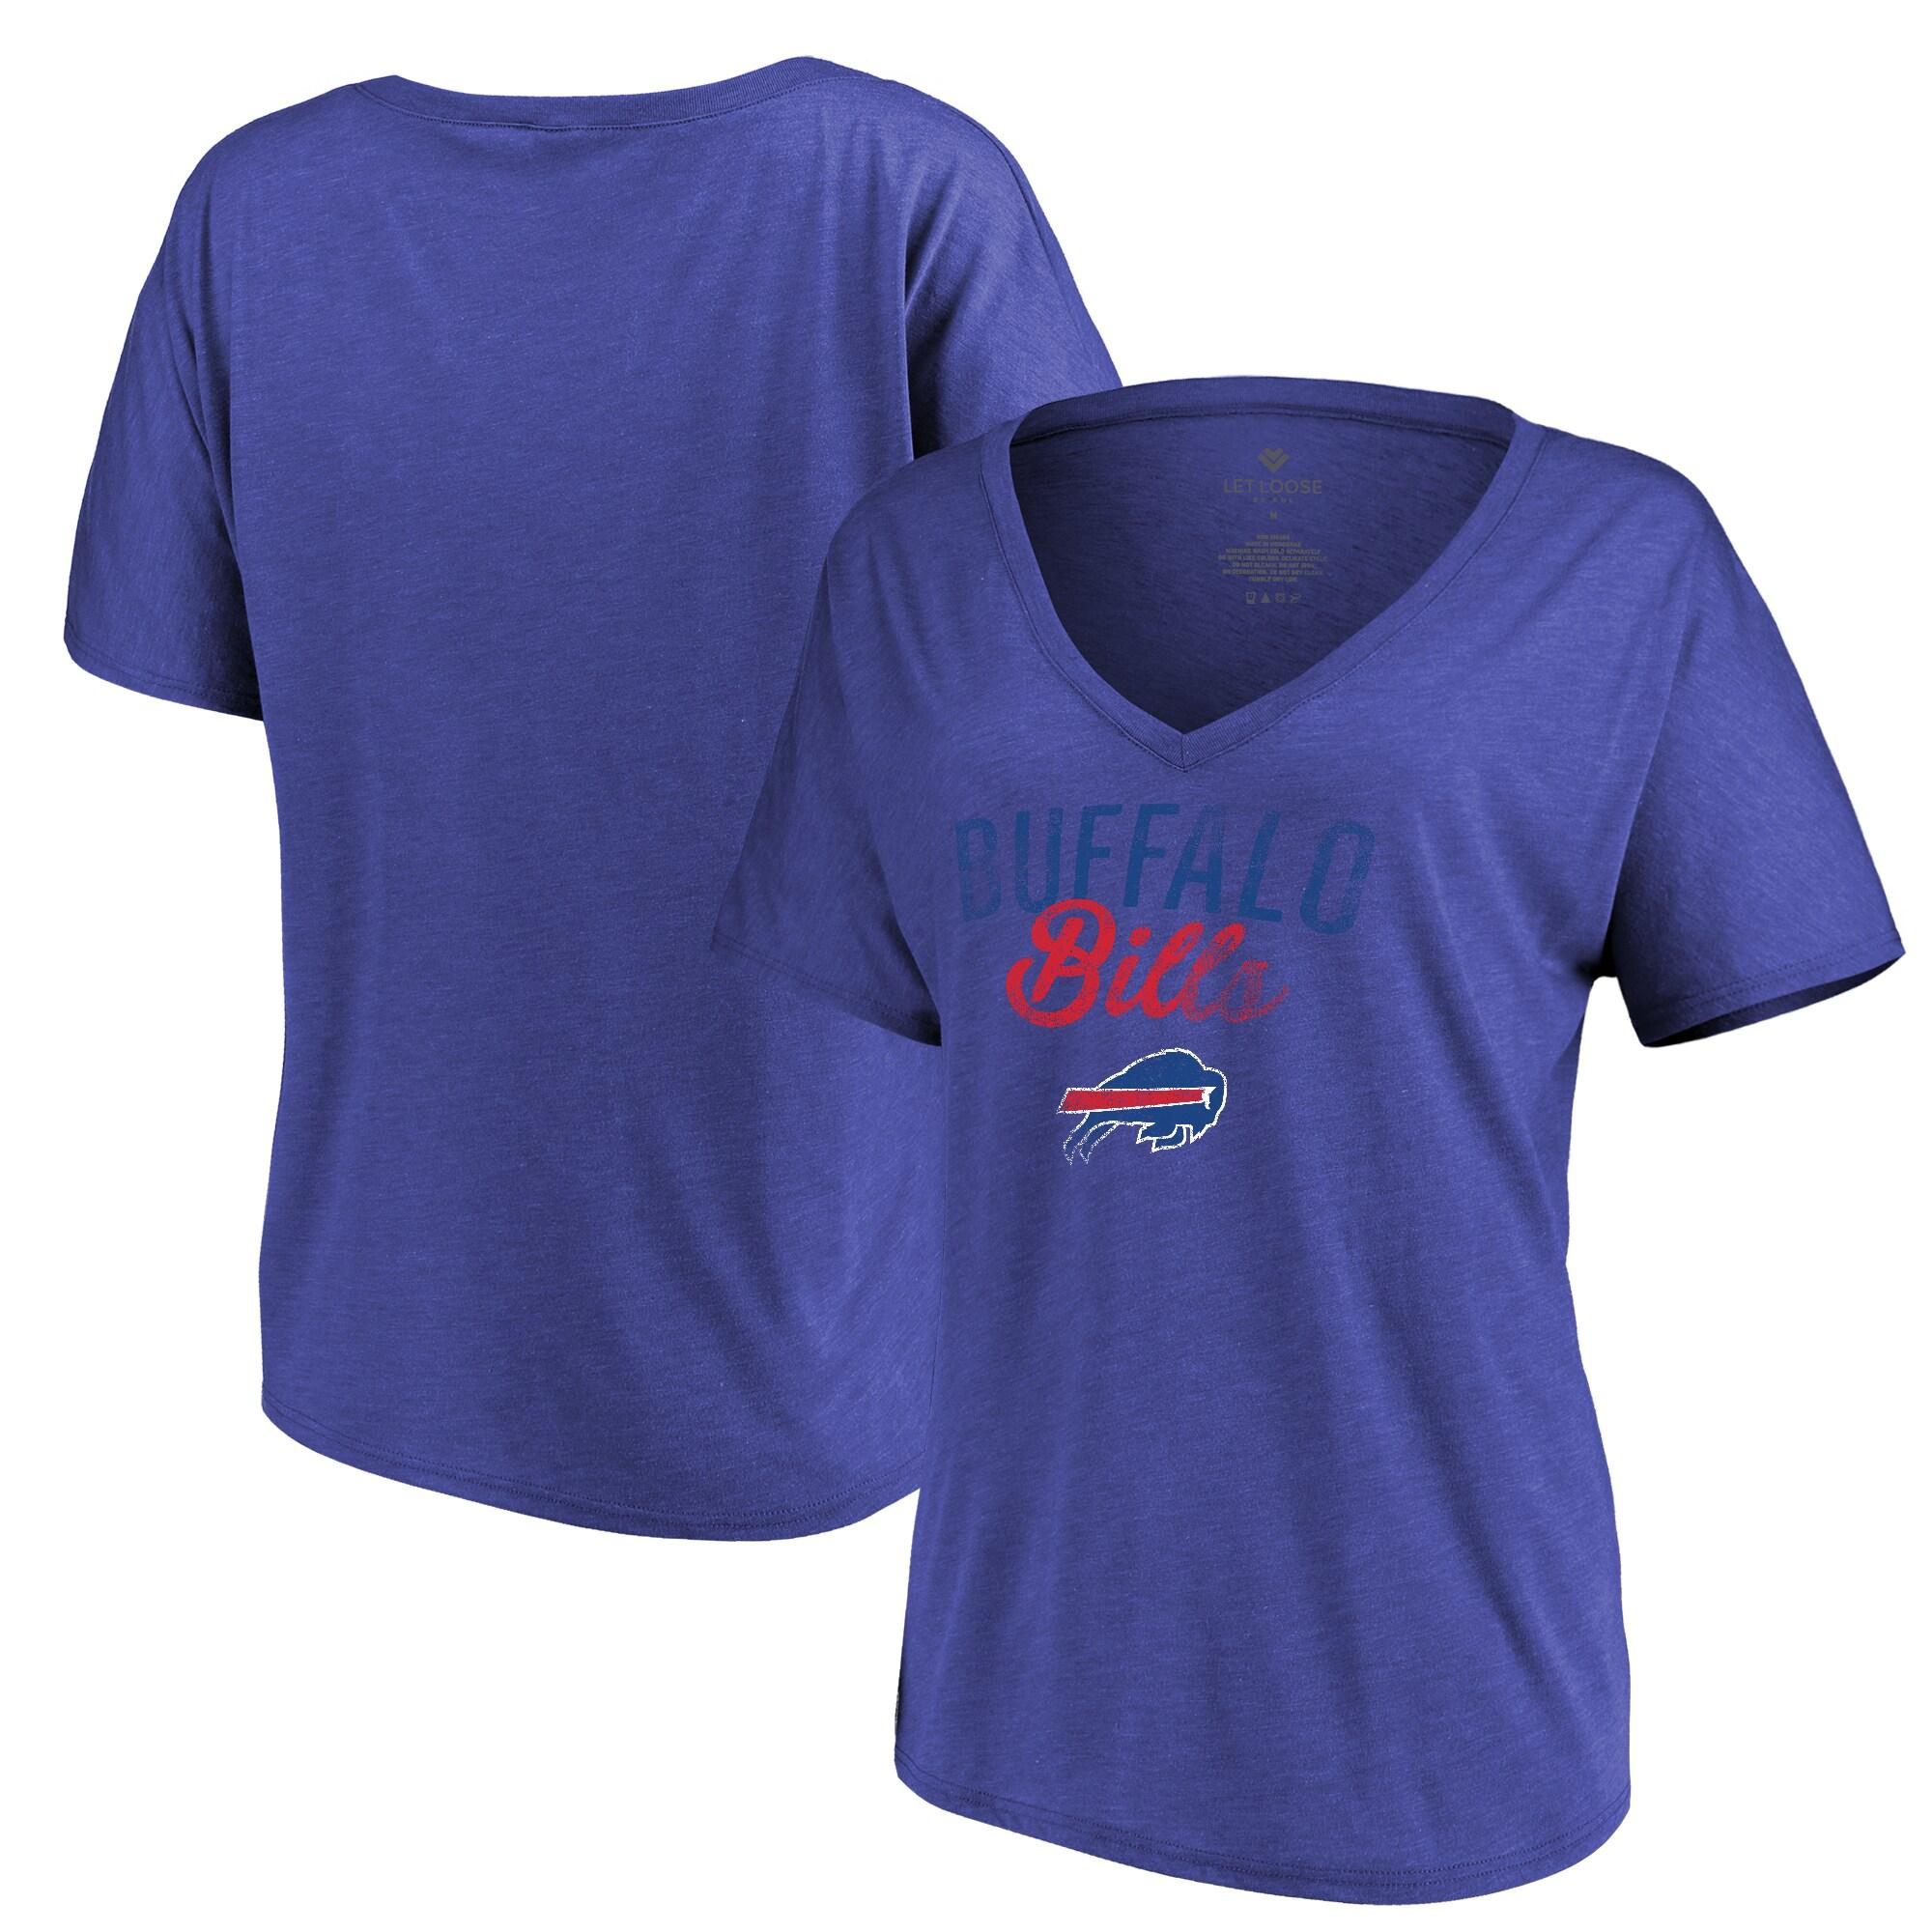 Buffalo Bills Let Loose by RNL Women's Endless V-Neck T-Shirt - Heathered Royal